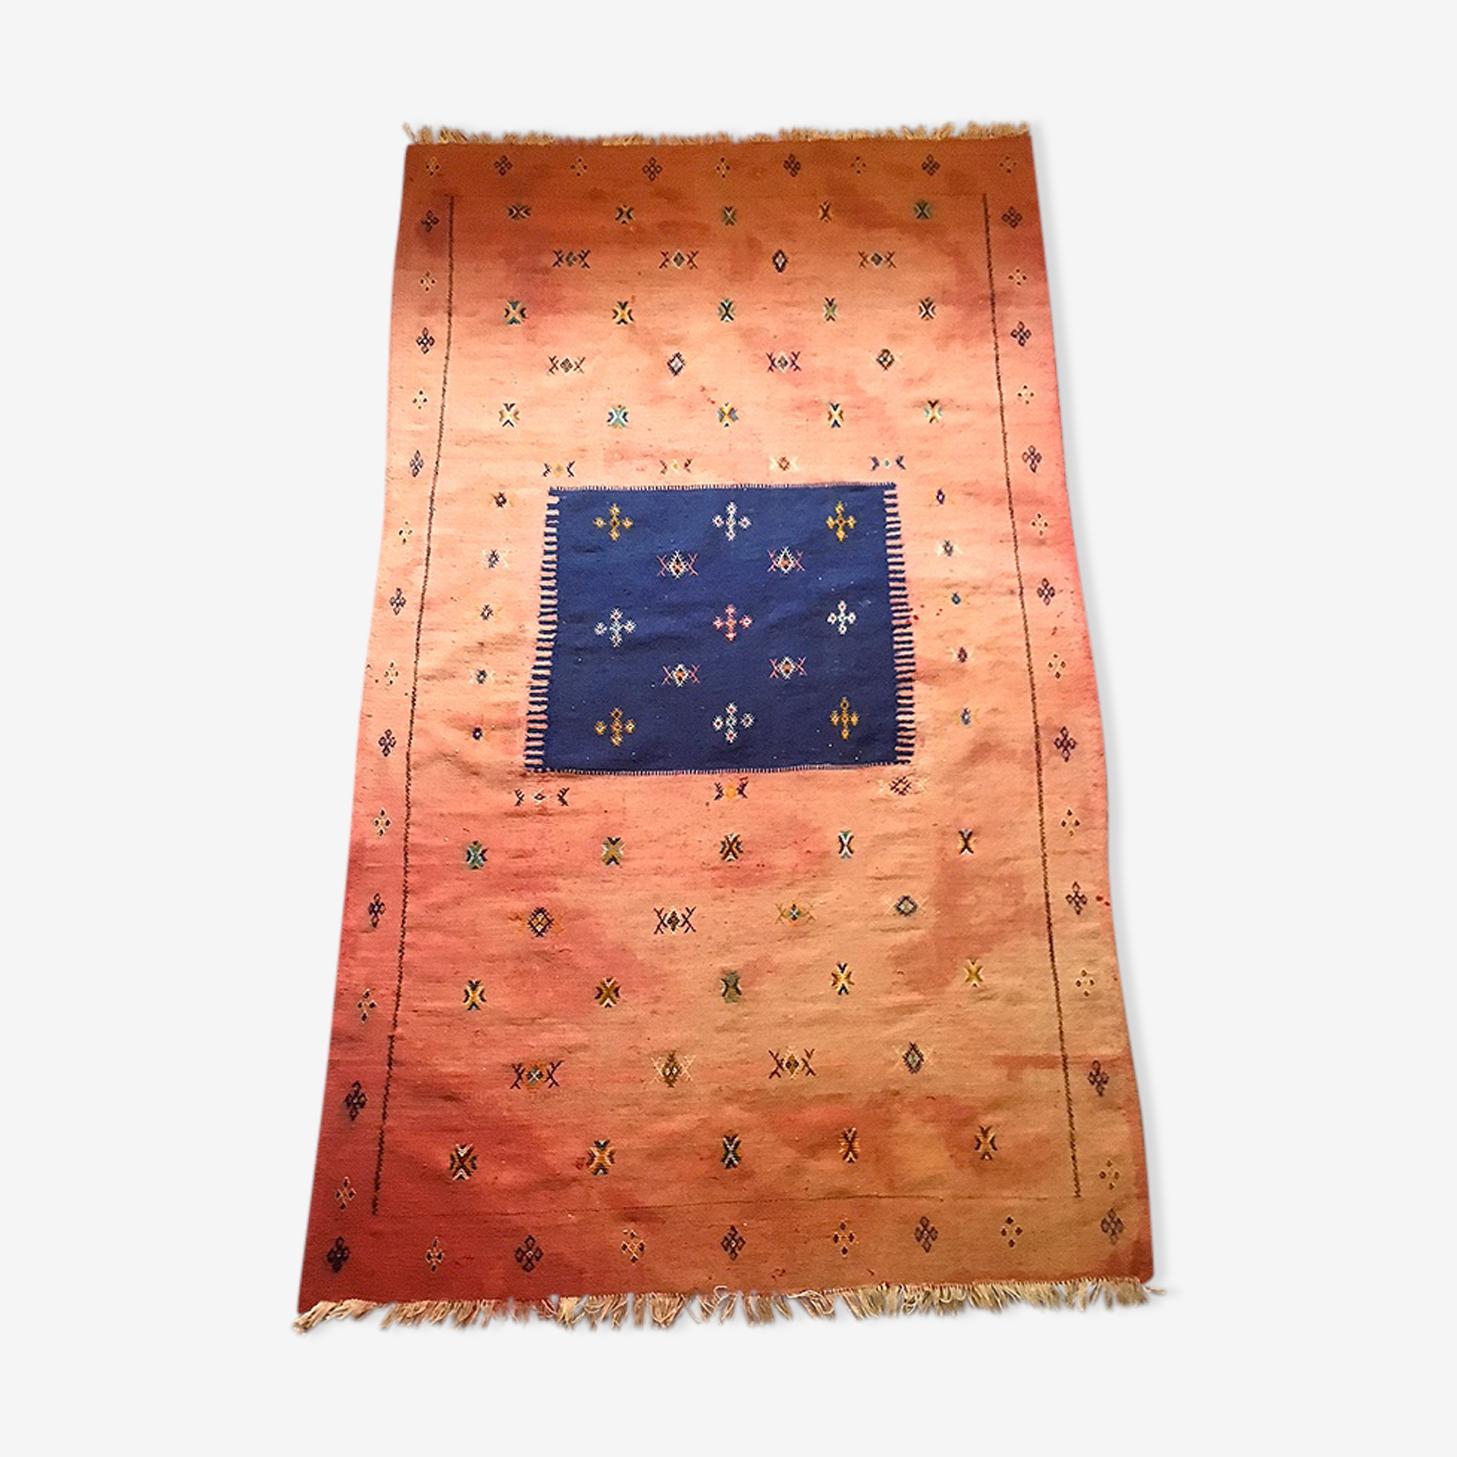 Hand-woven Berber kilim carpet 120 x 210cm